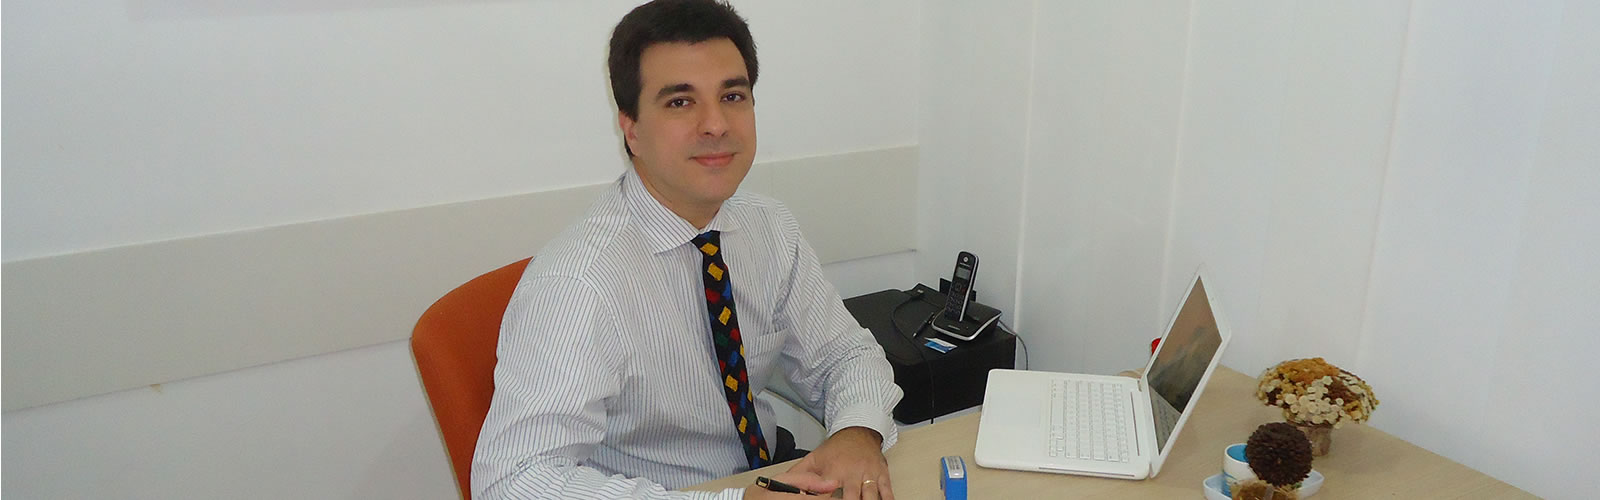 Dr. Marco Daiha